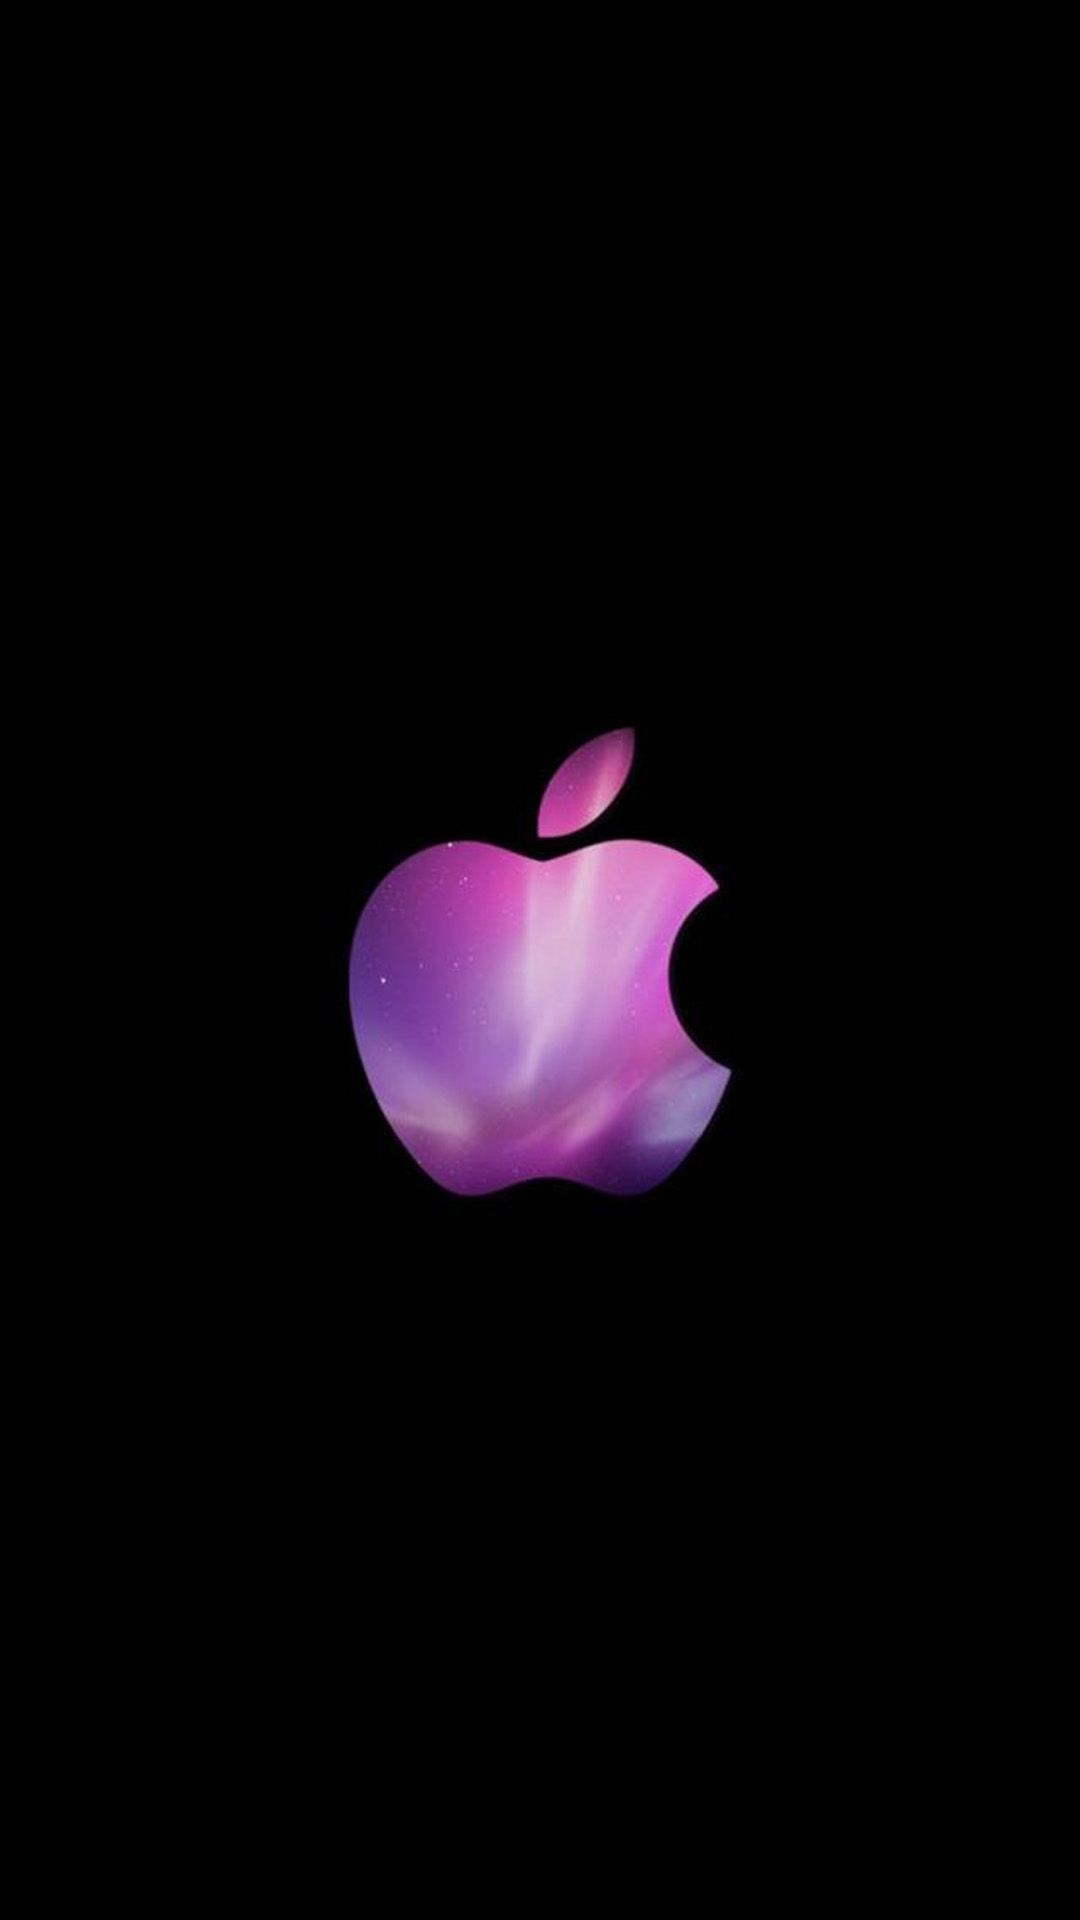 Apple Logo iPhone Wallpaper 6 Bing images